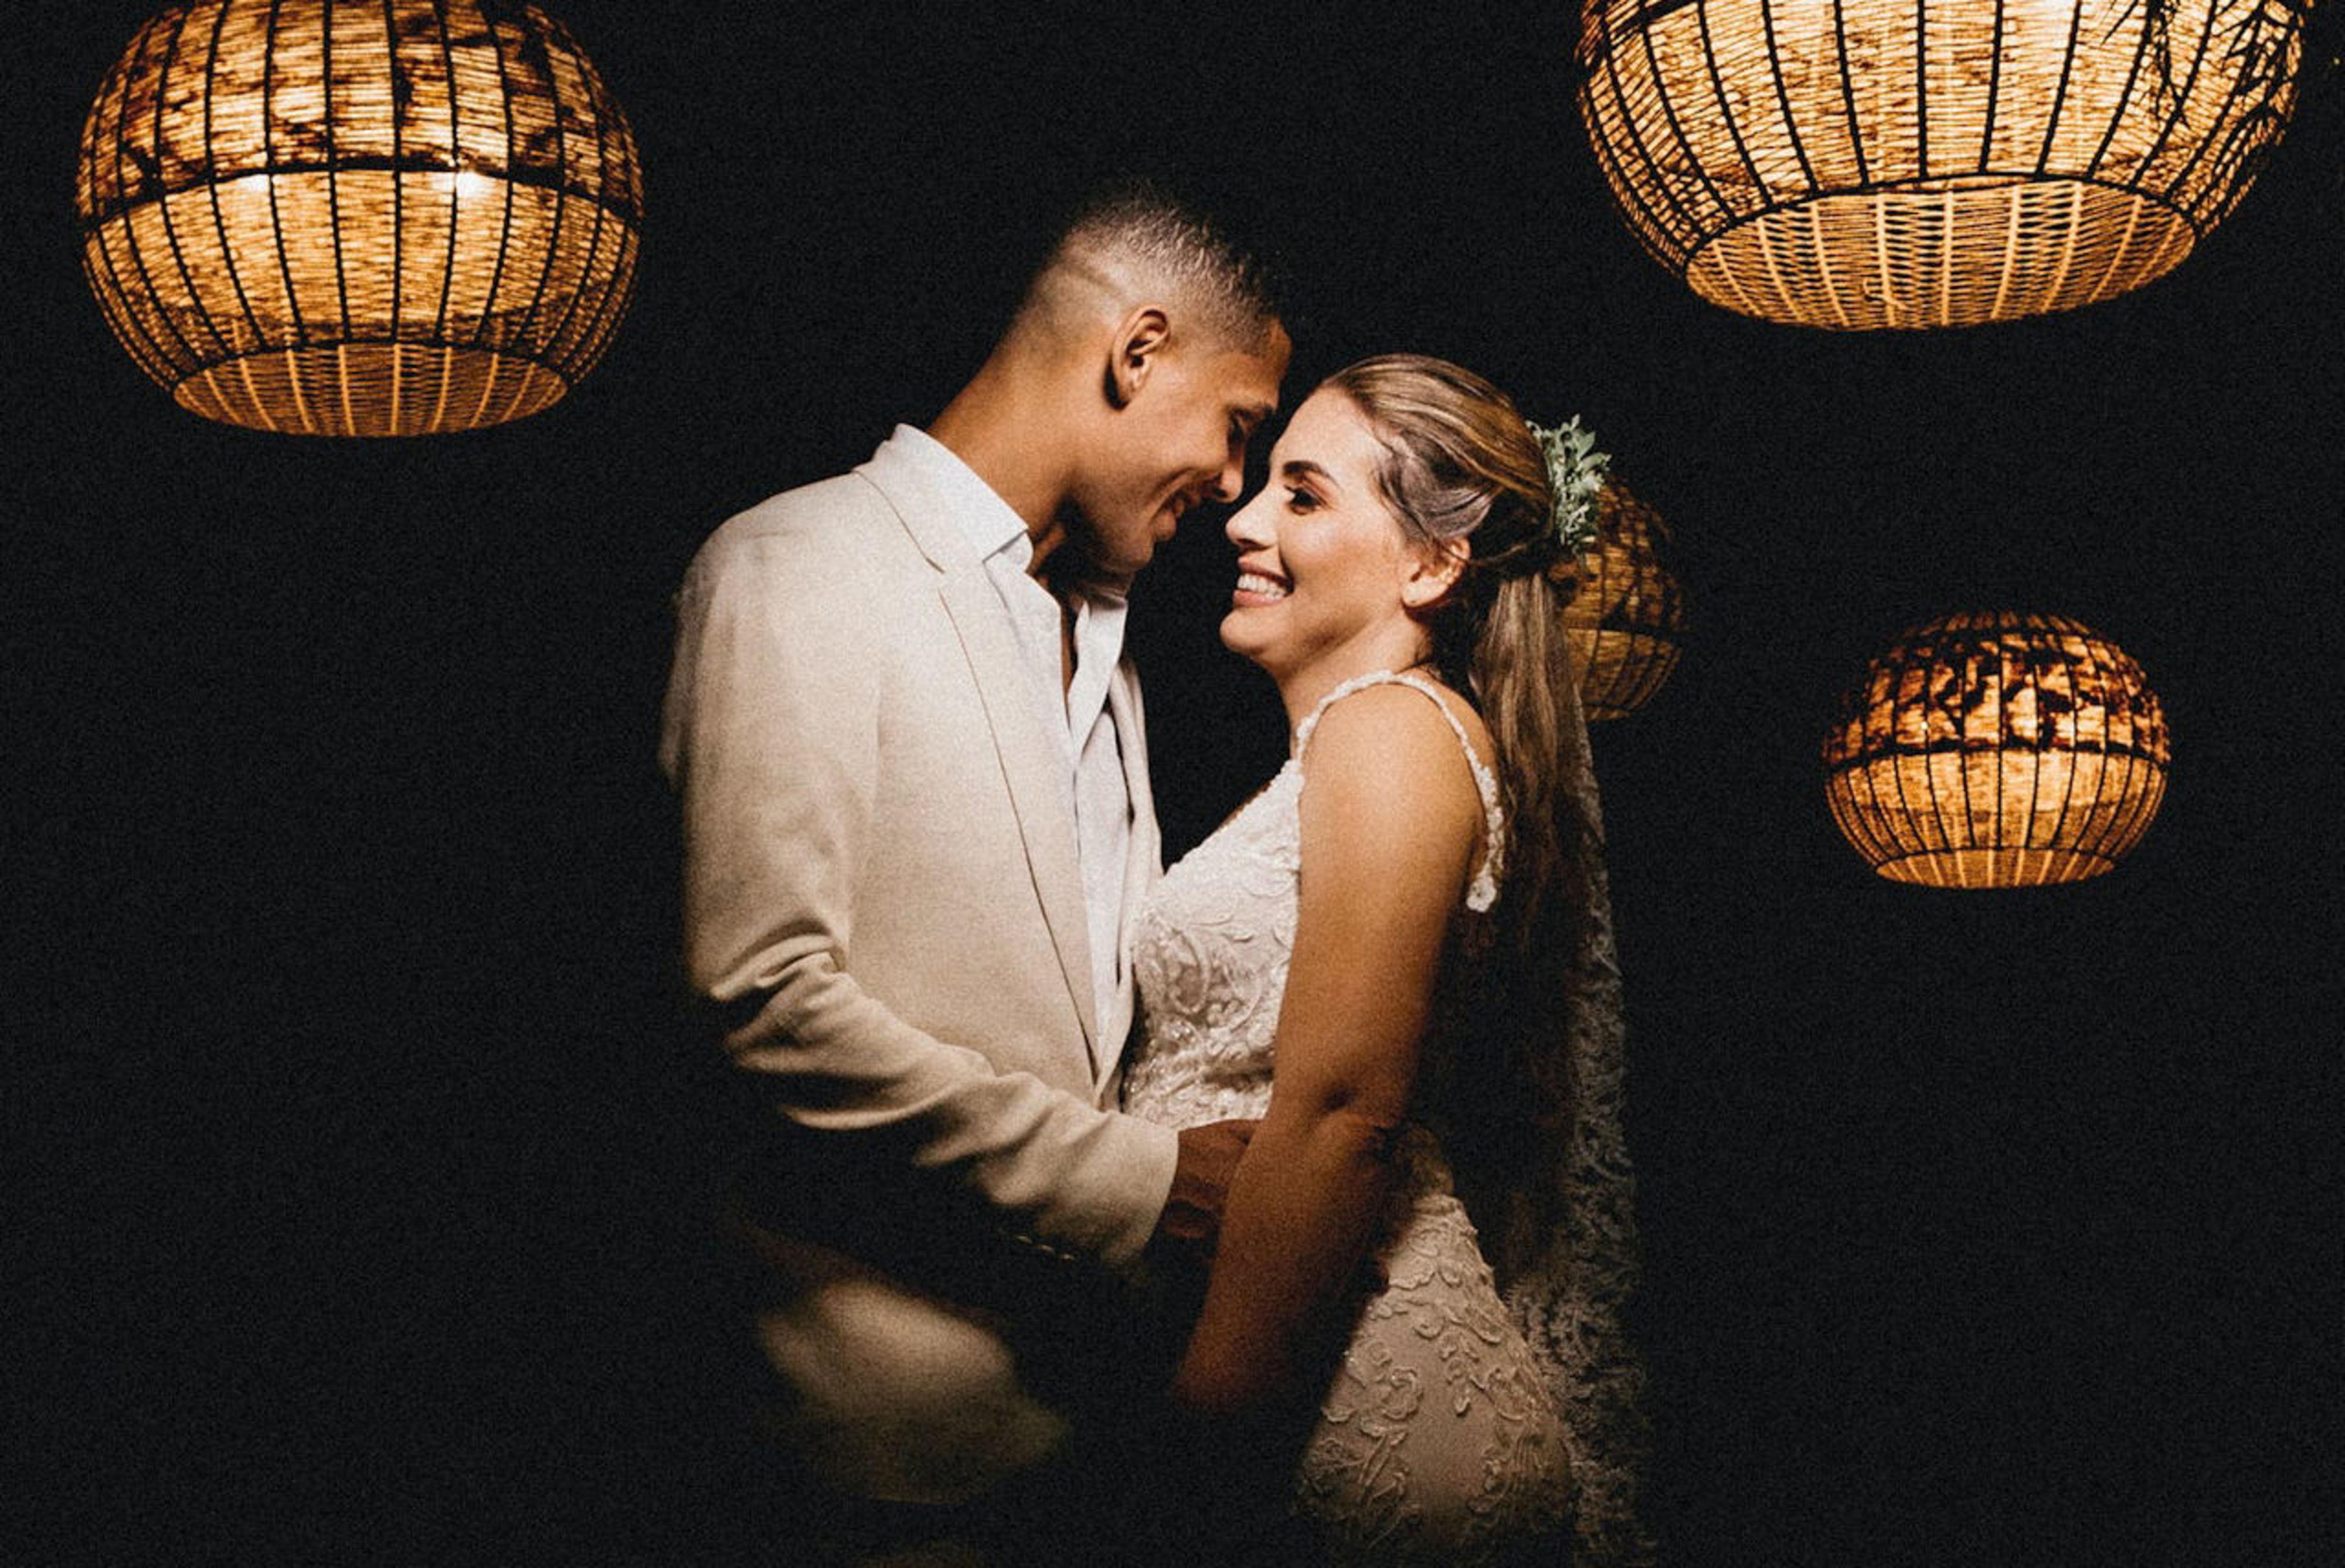 Verlichting op jullie bruiloft